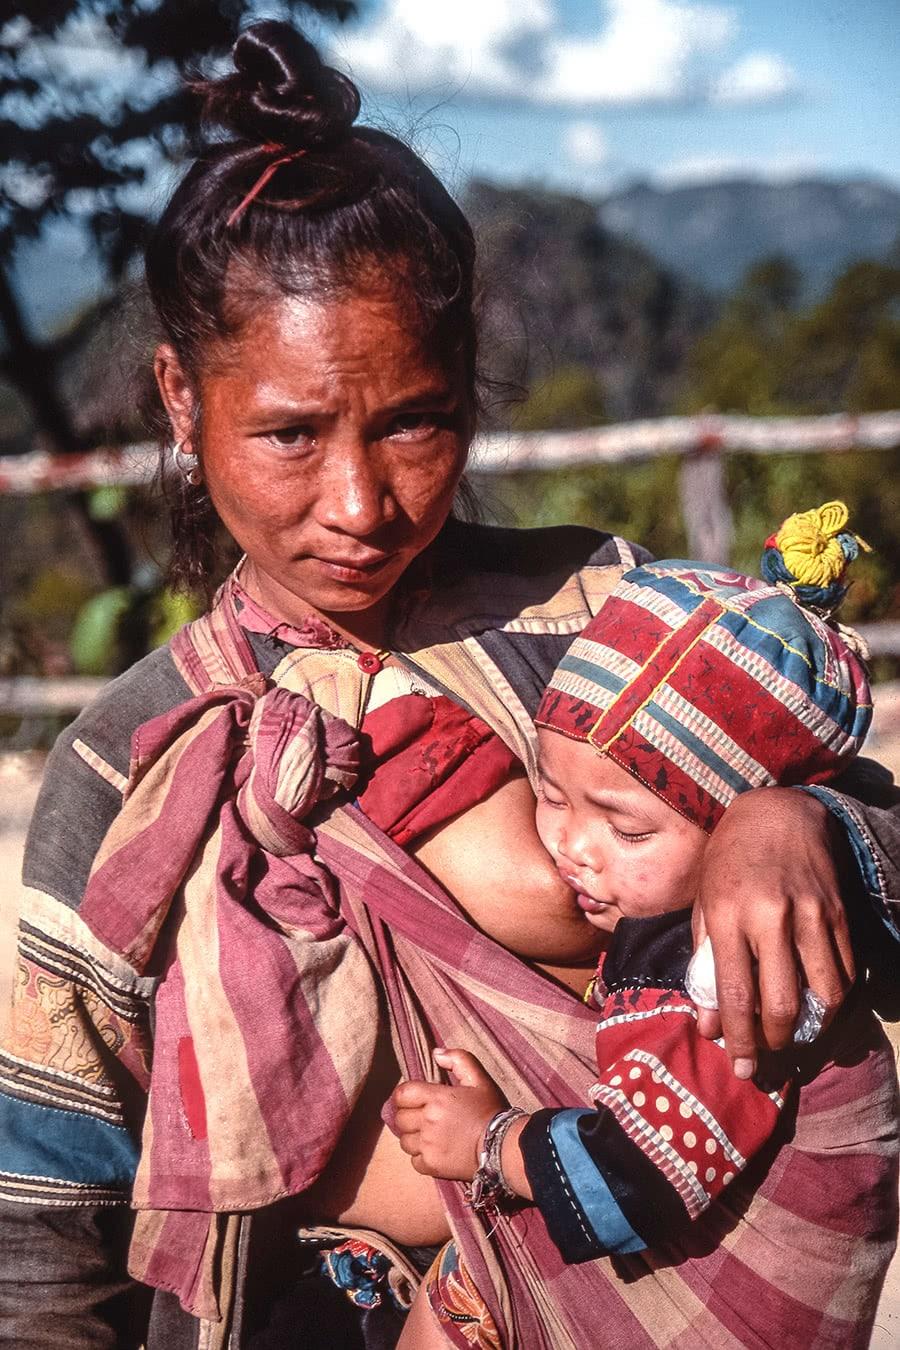 Lisu woman with a child, taken in 1993 in northern Thailand.